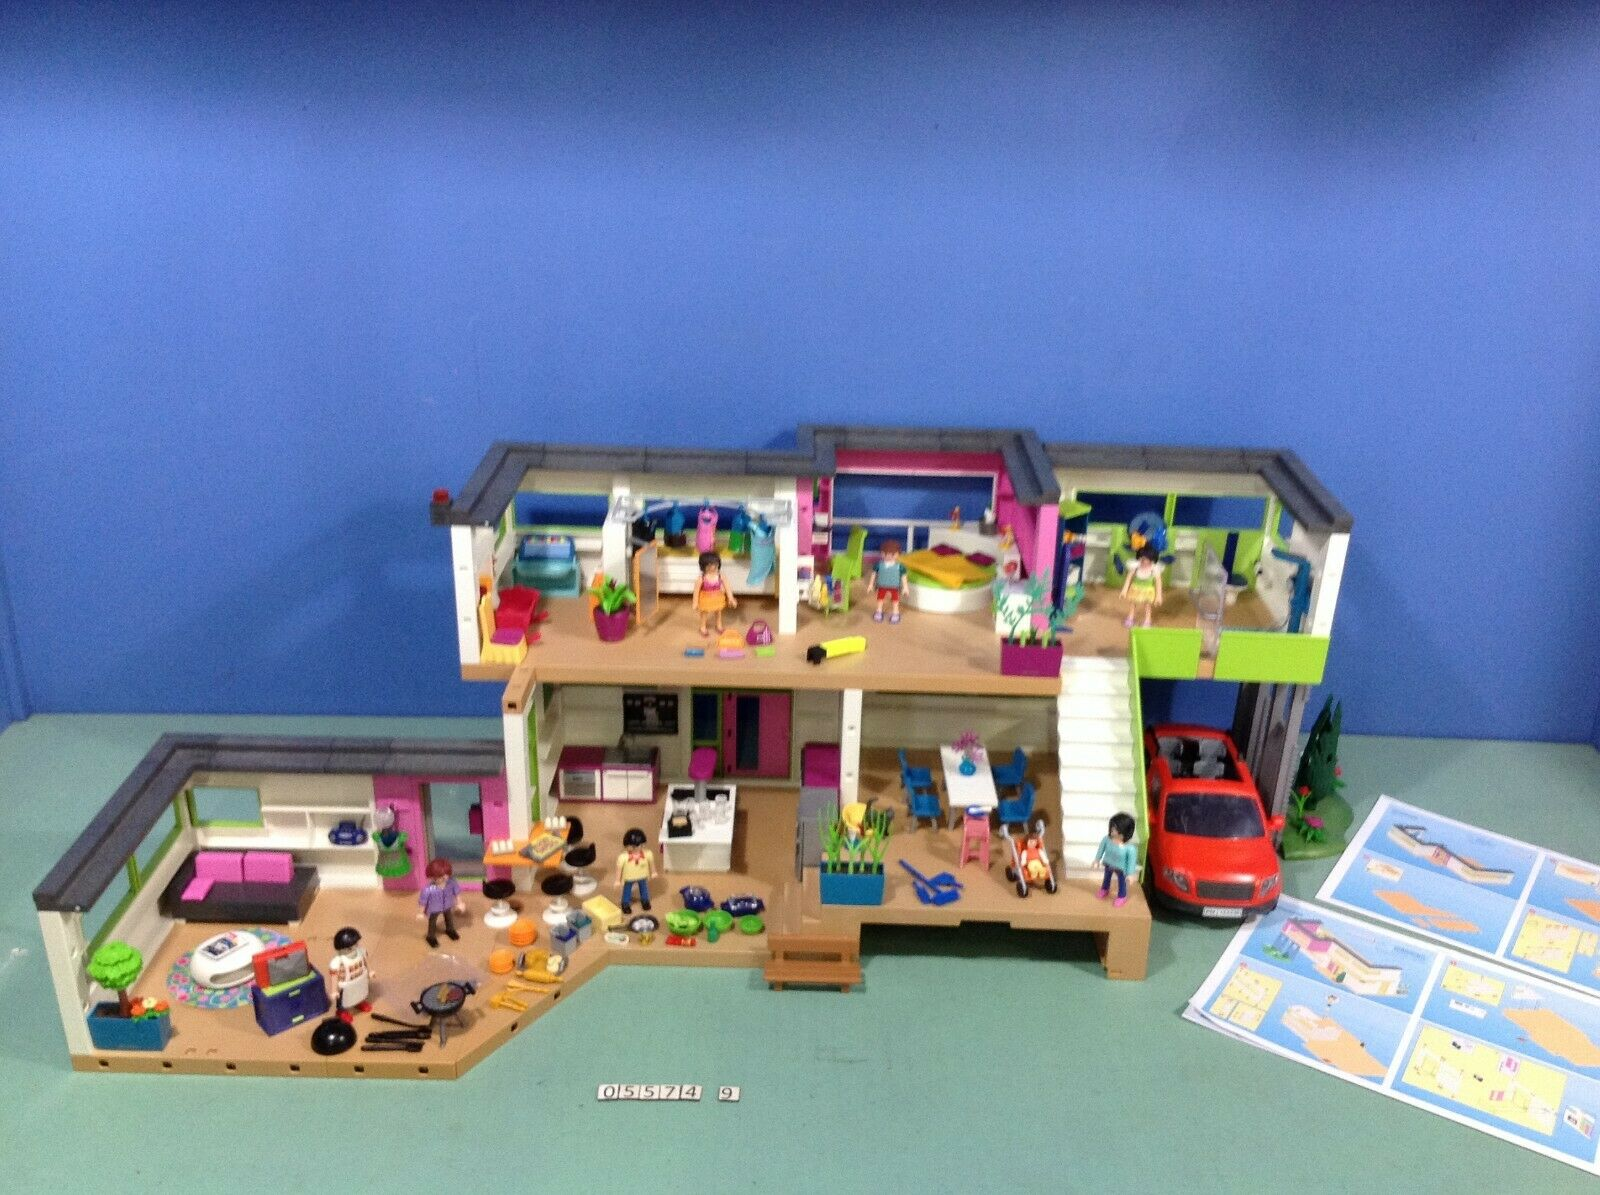 O5574.9) playmobil grande maison moderne ref 5574 10 ref ...